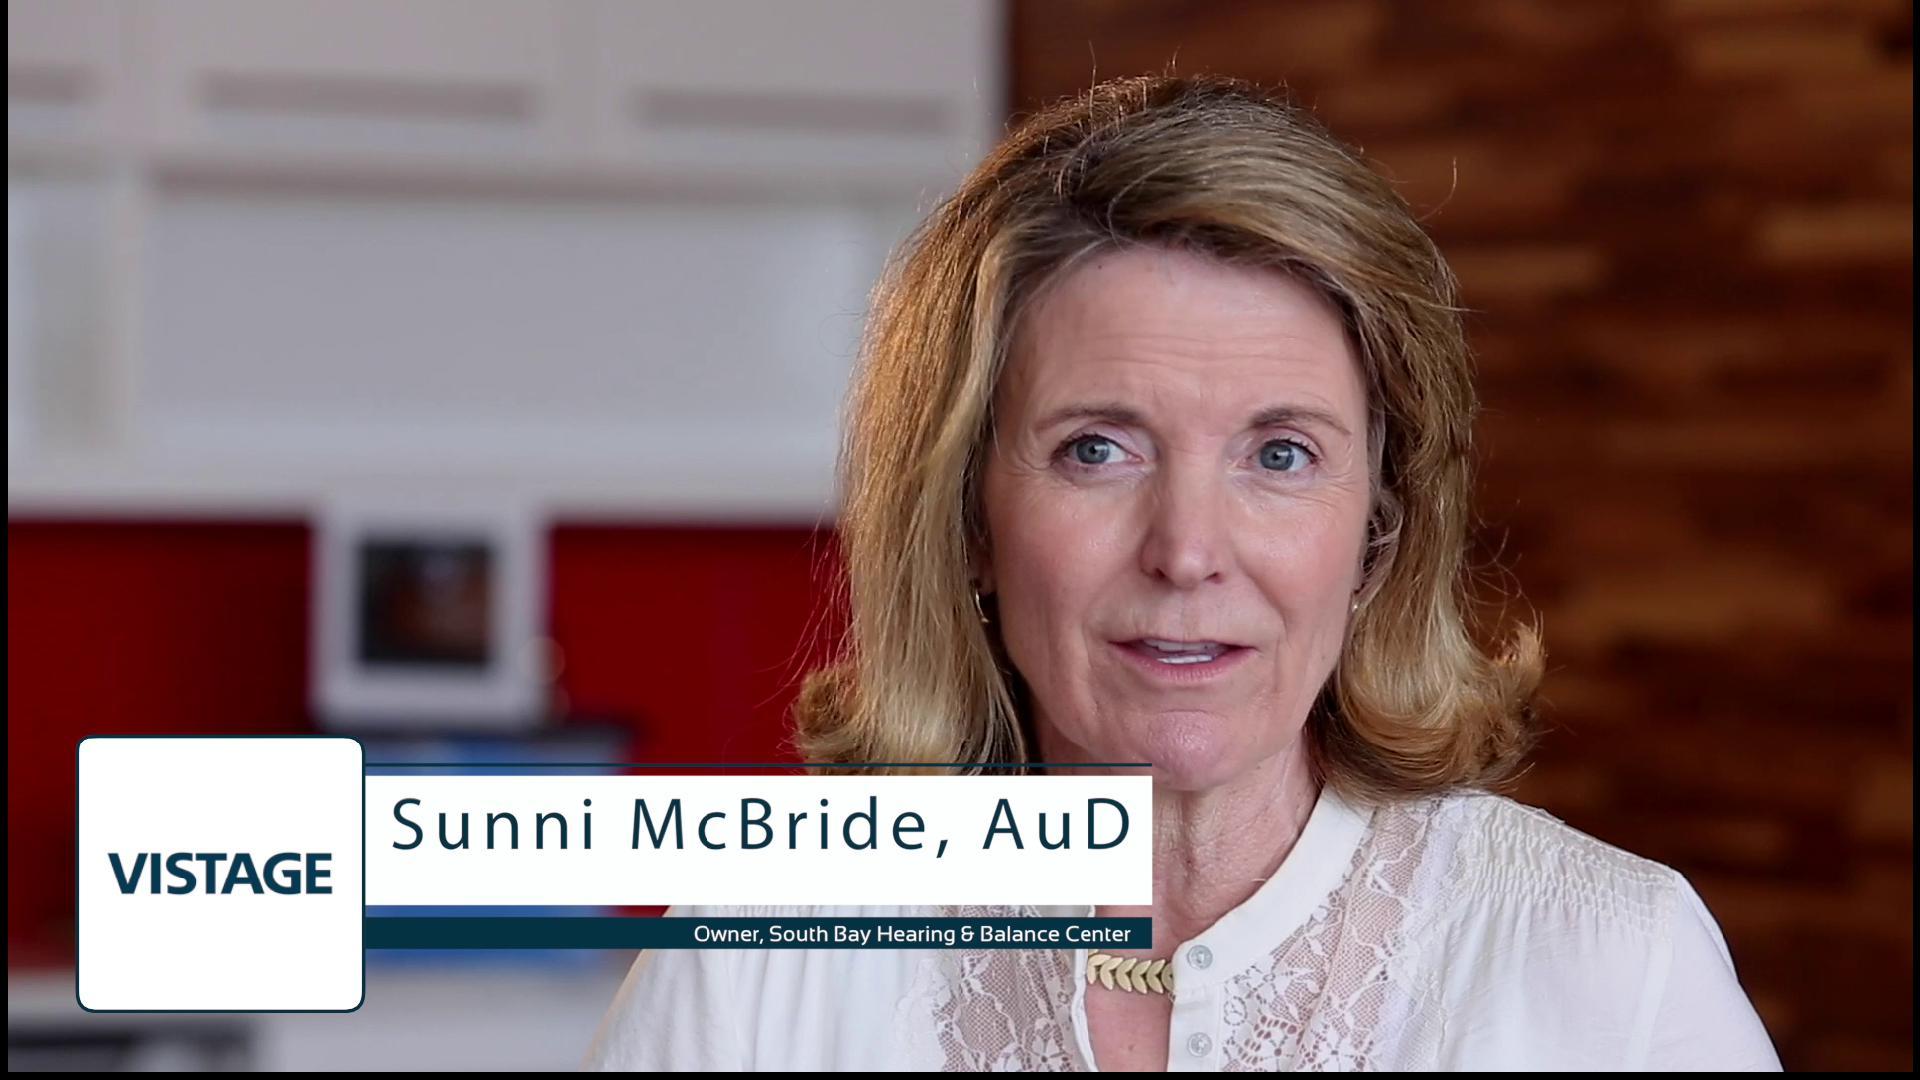 Sunni McBride